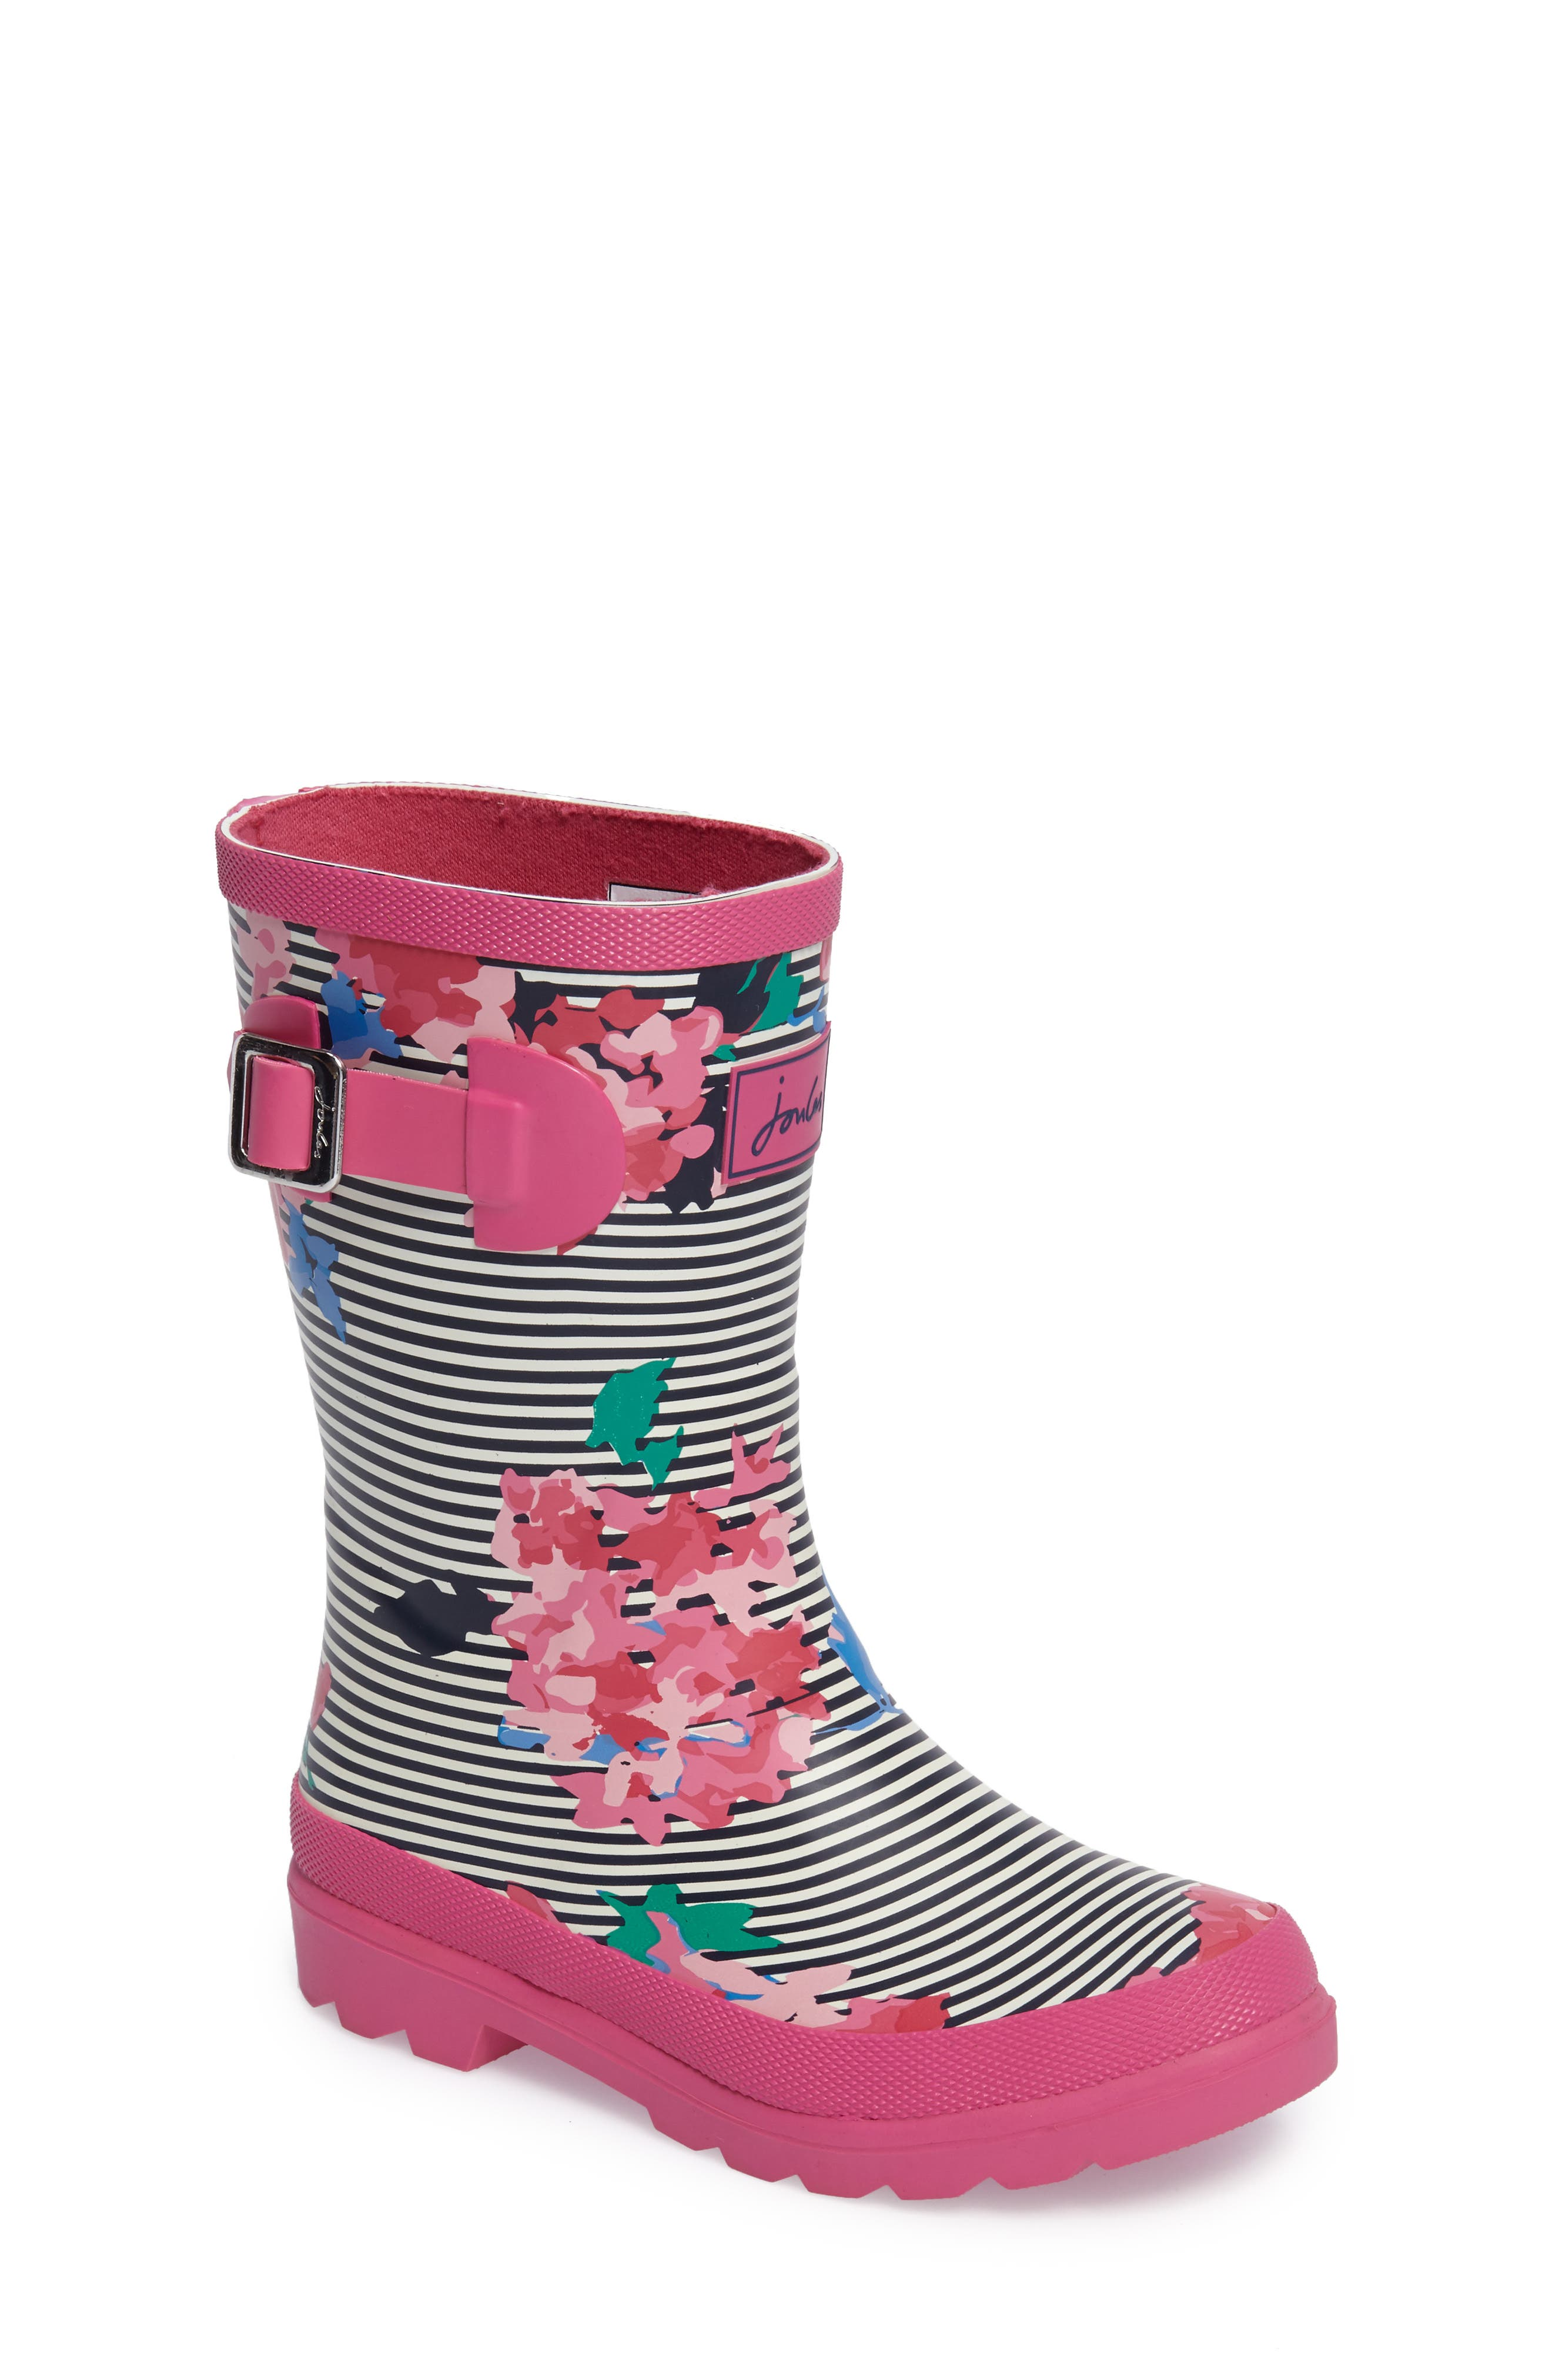 Welly Printed Waterproof Rain Boot,                         Main,                         color, PINK STRIPE FLORAL